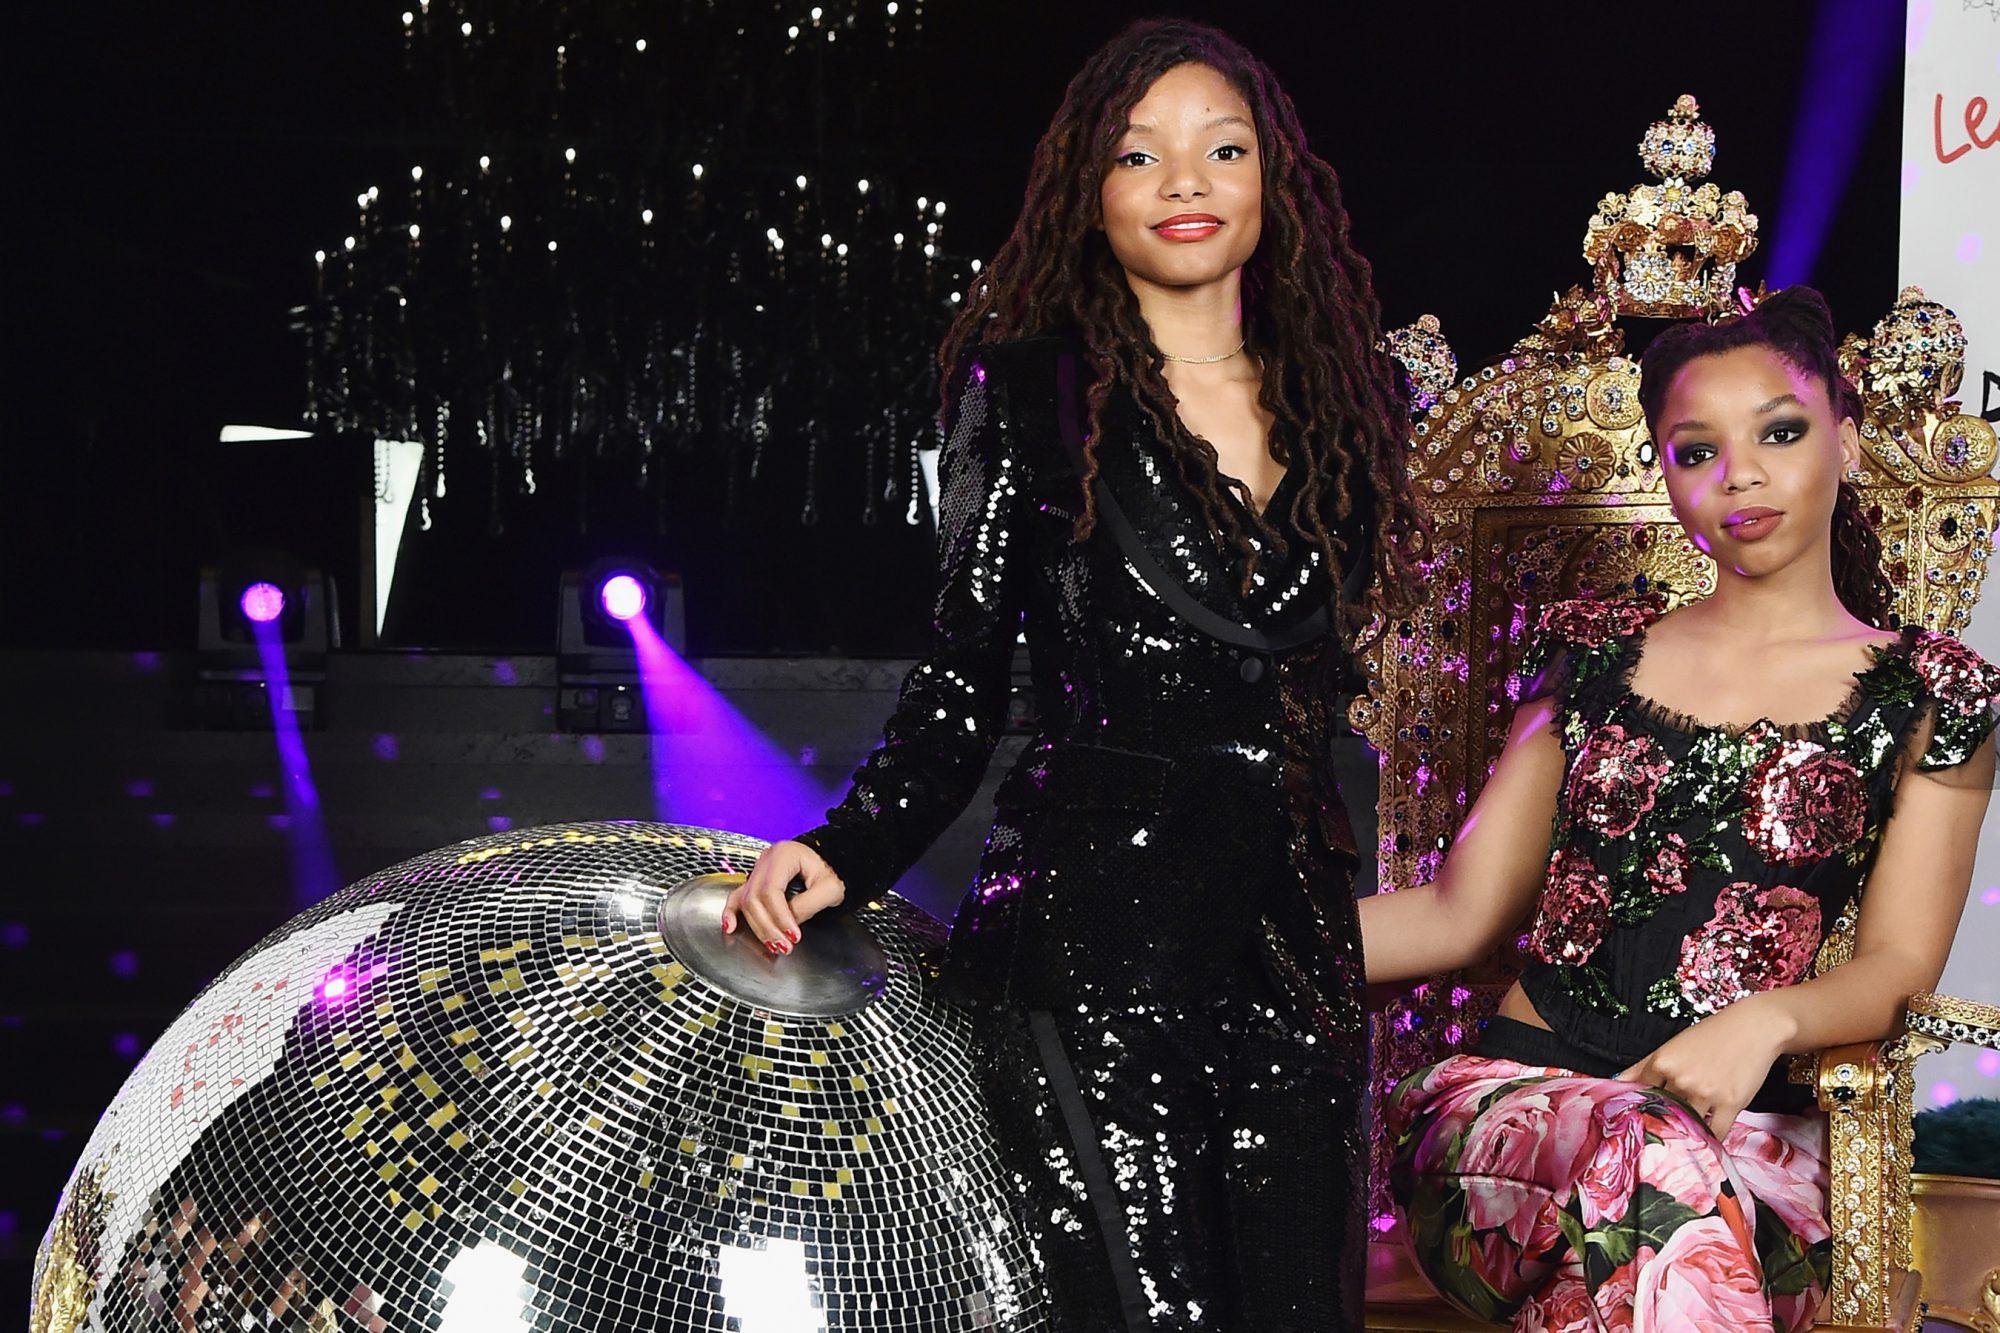 Dolce & Gabbana - 'Dancing Queen' After Show Party - Milan Fashion Week Fall/Winter 2017/18